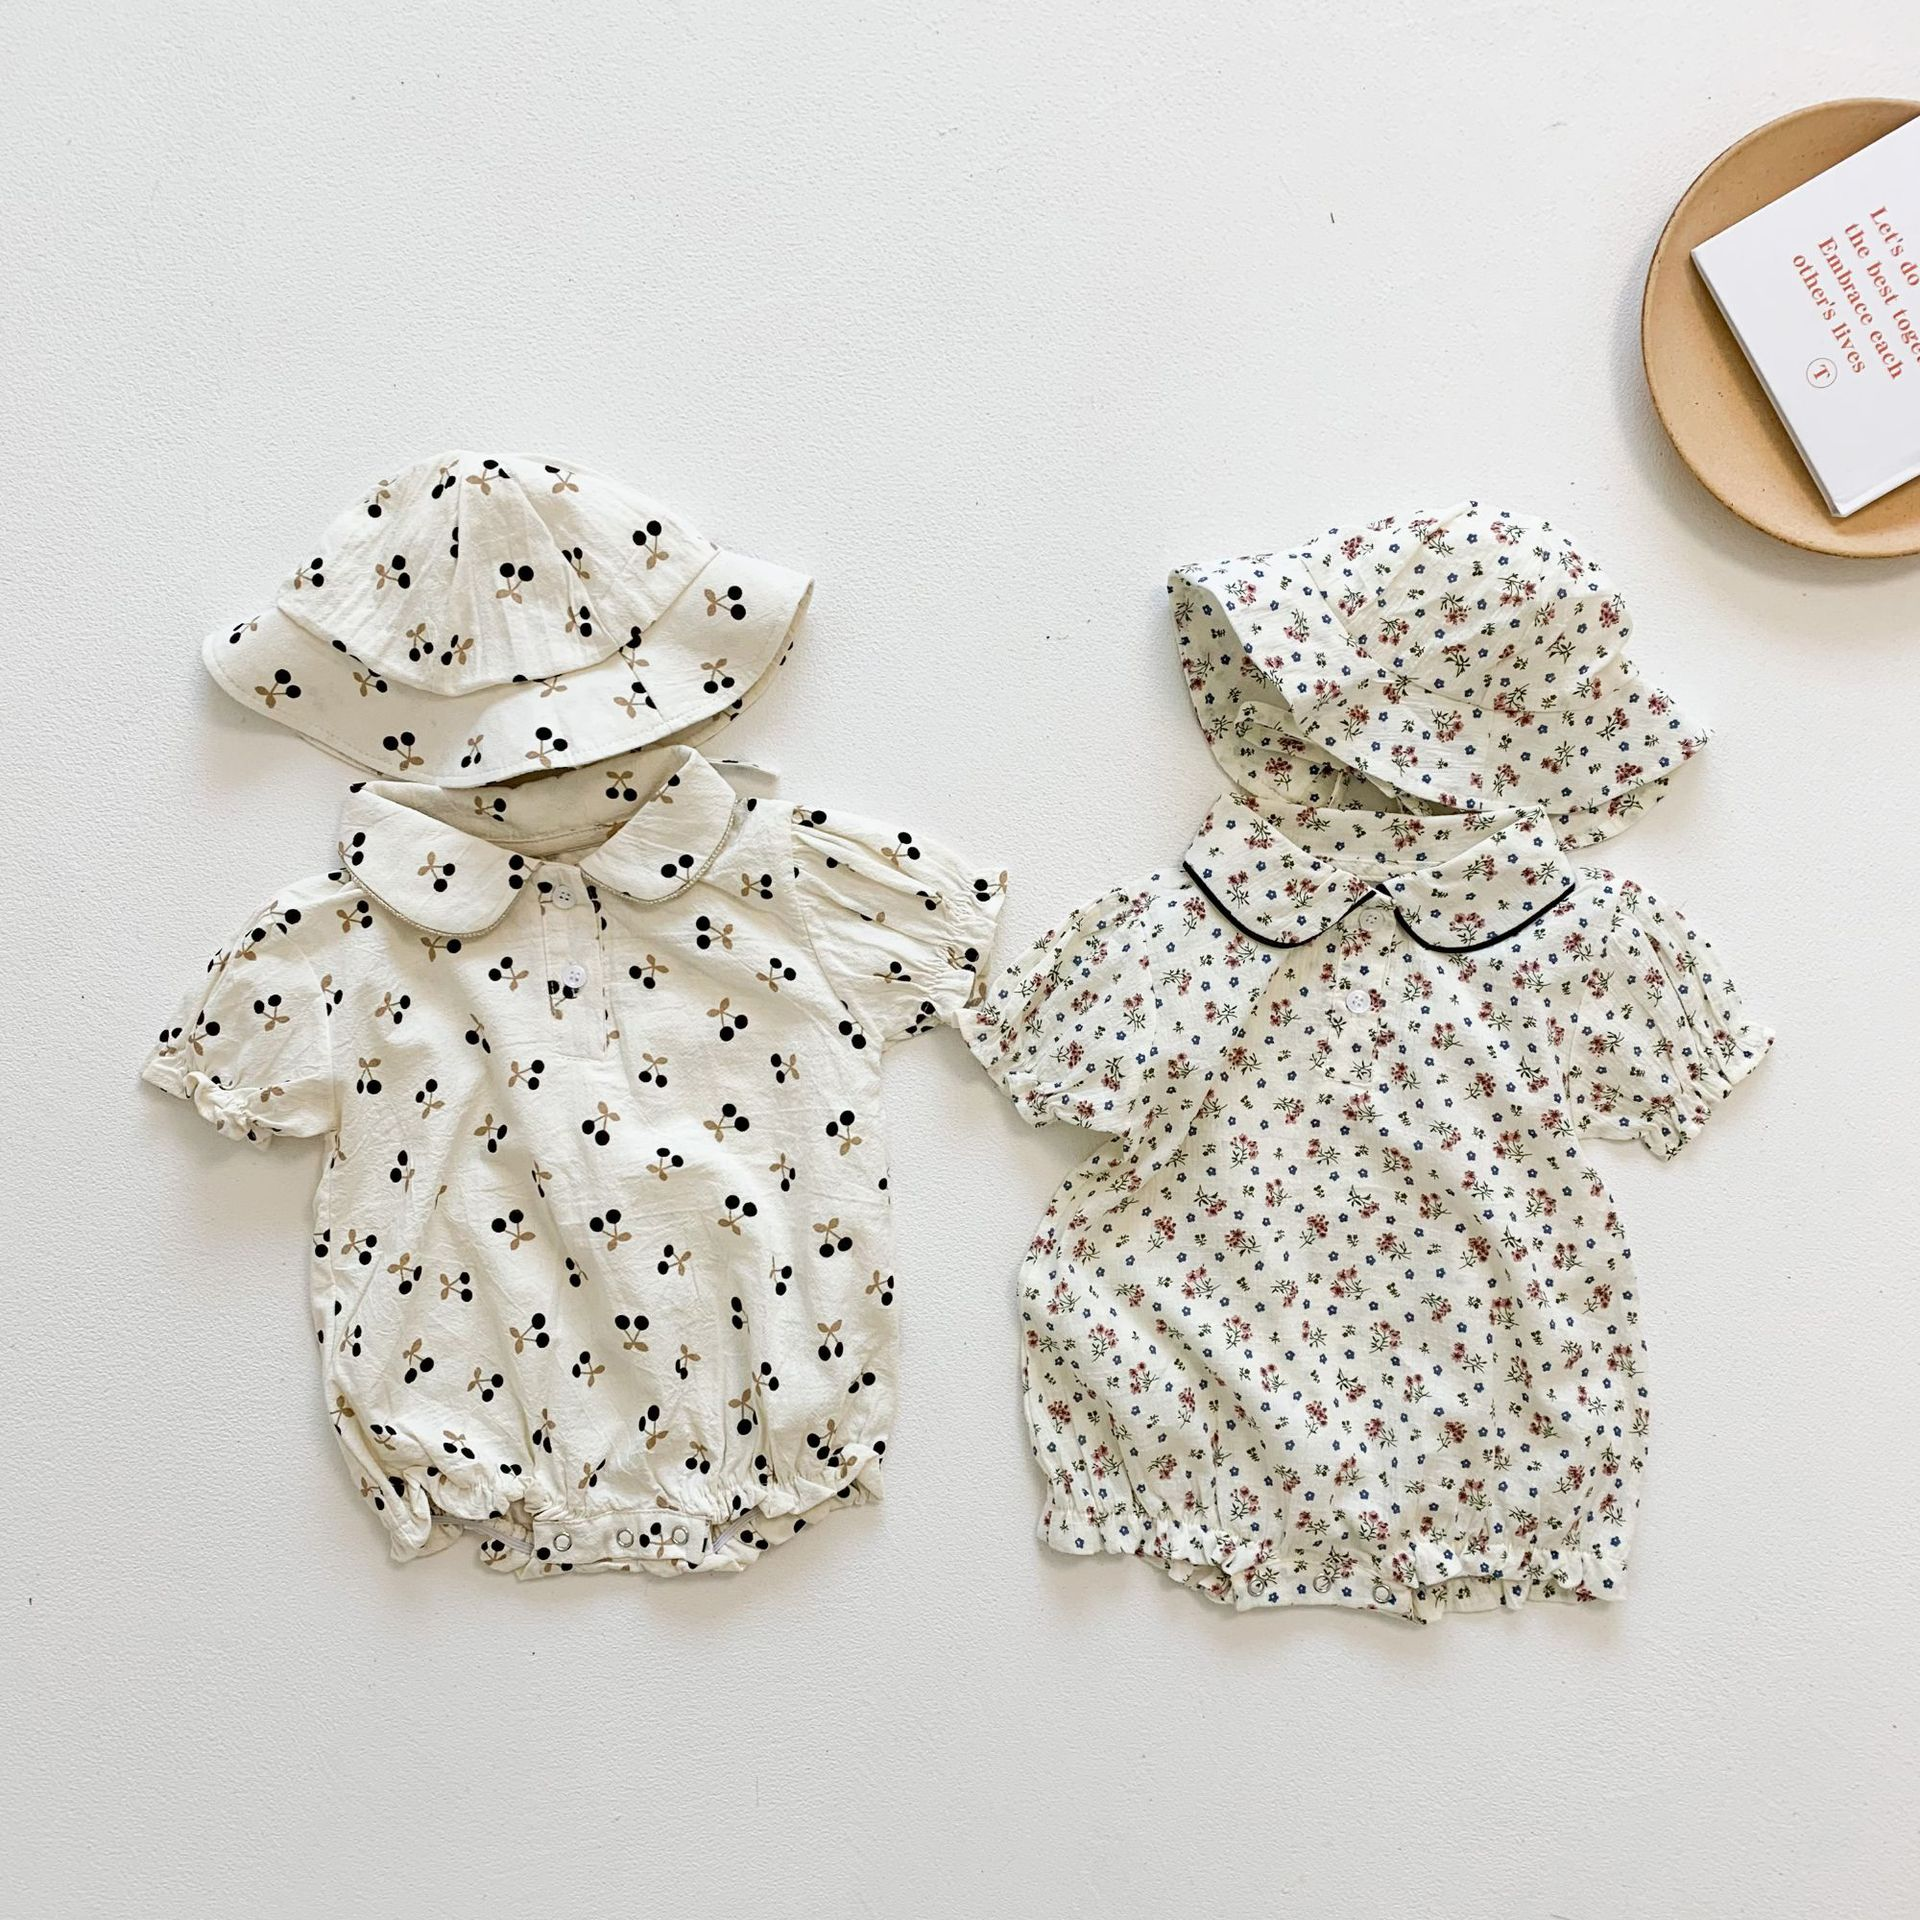 Yg Brand Children's Wear, Summer Little Flower Girl's One-piece Suit, Cherry Baby Girl's Short Sleev